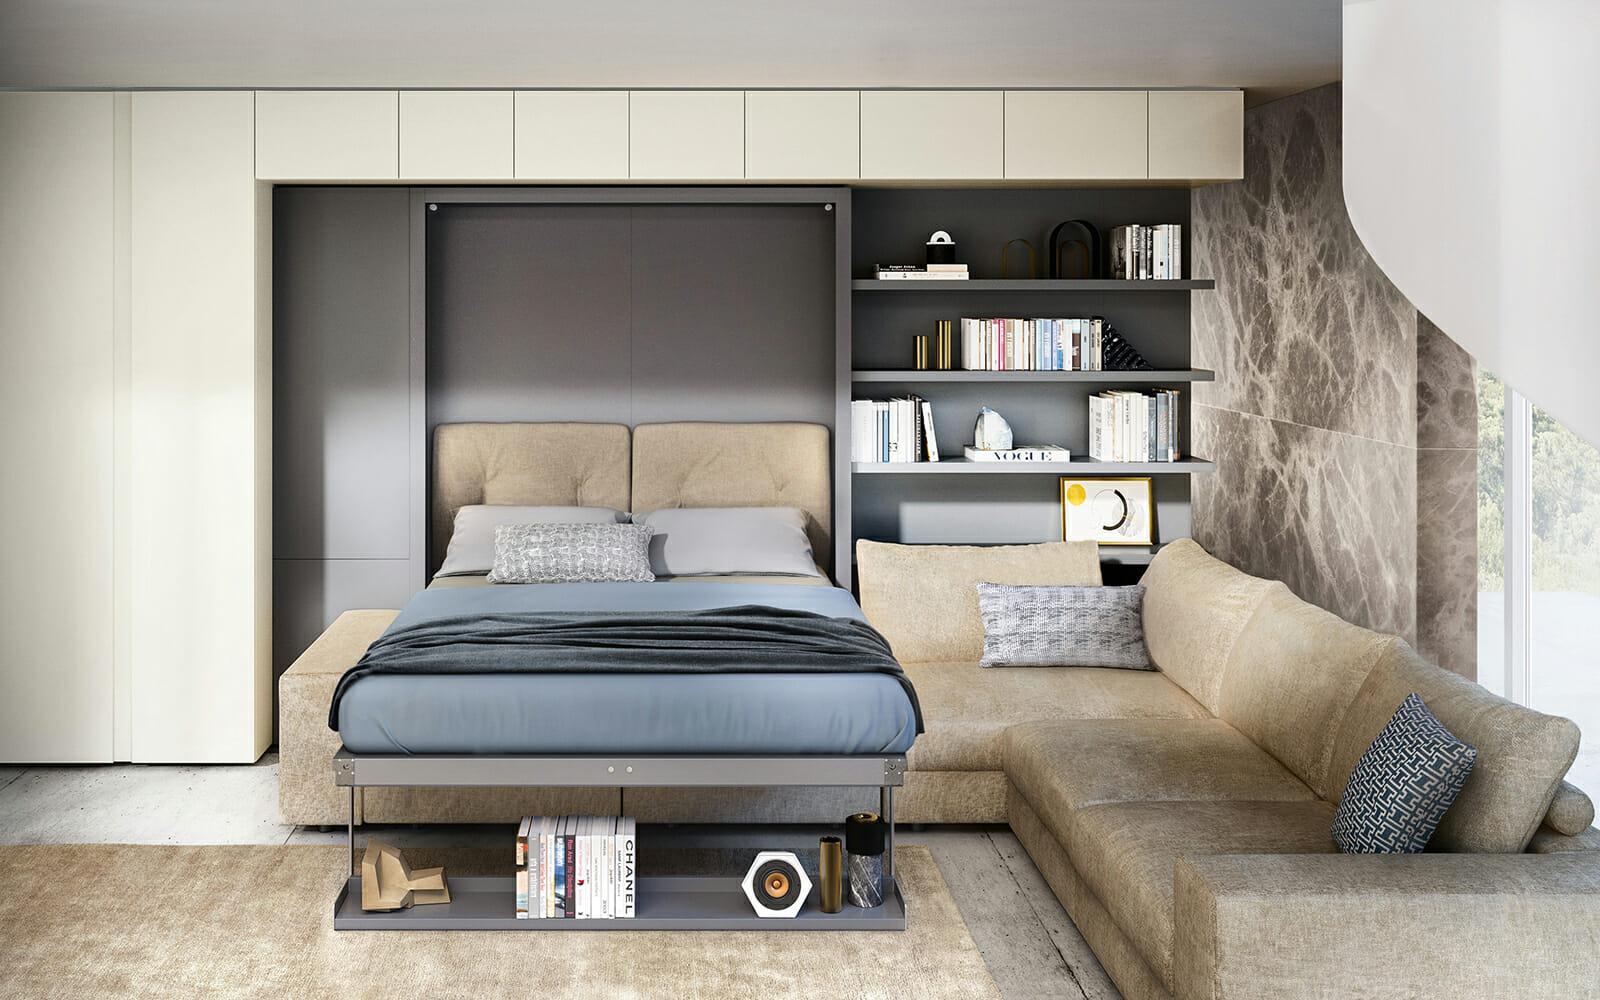 Make Storage Friendly walls